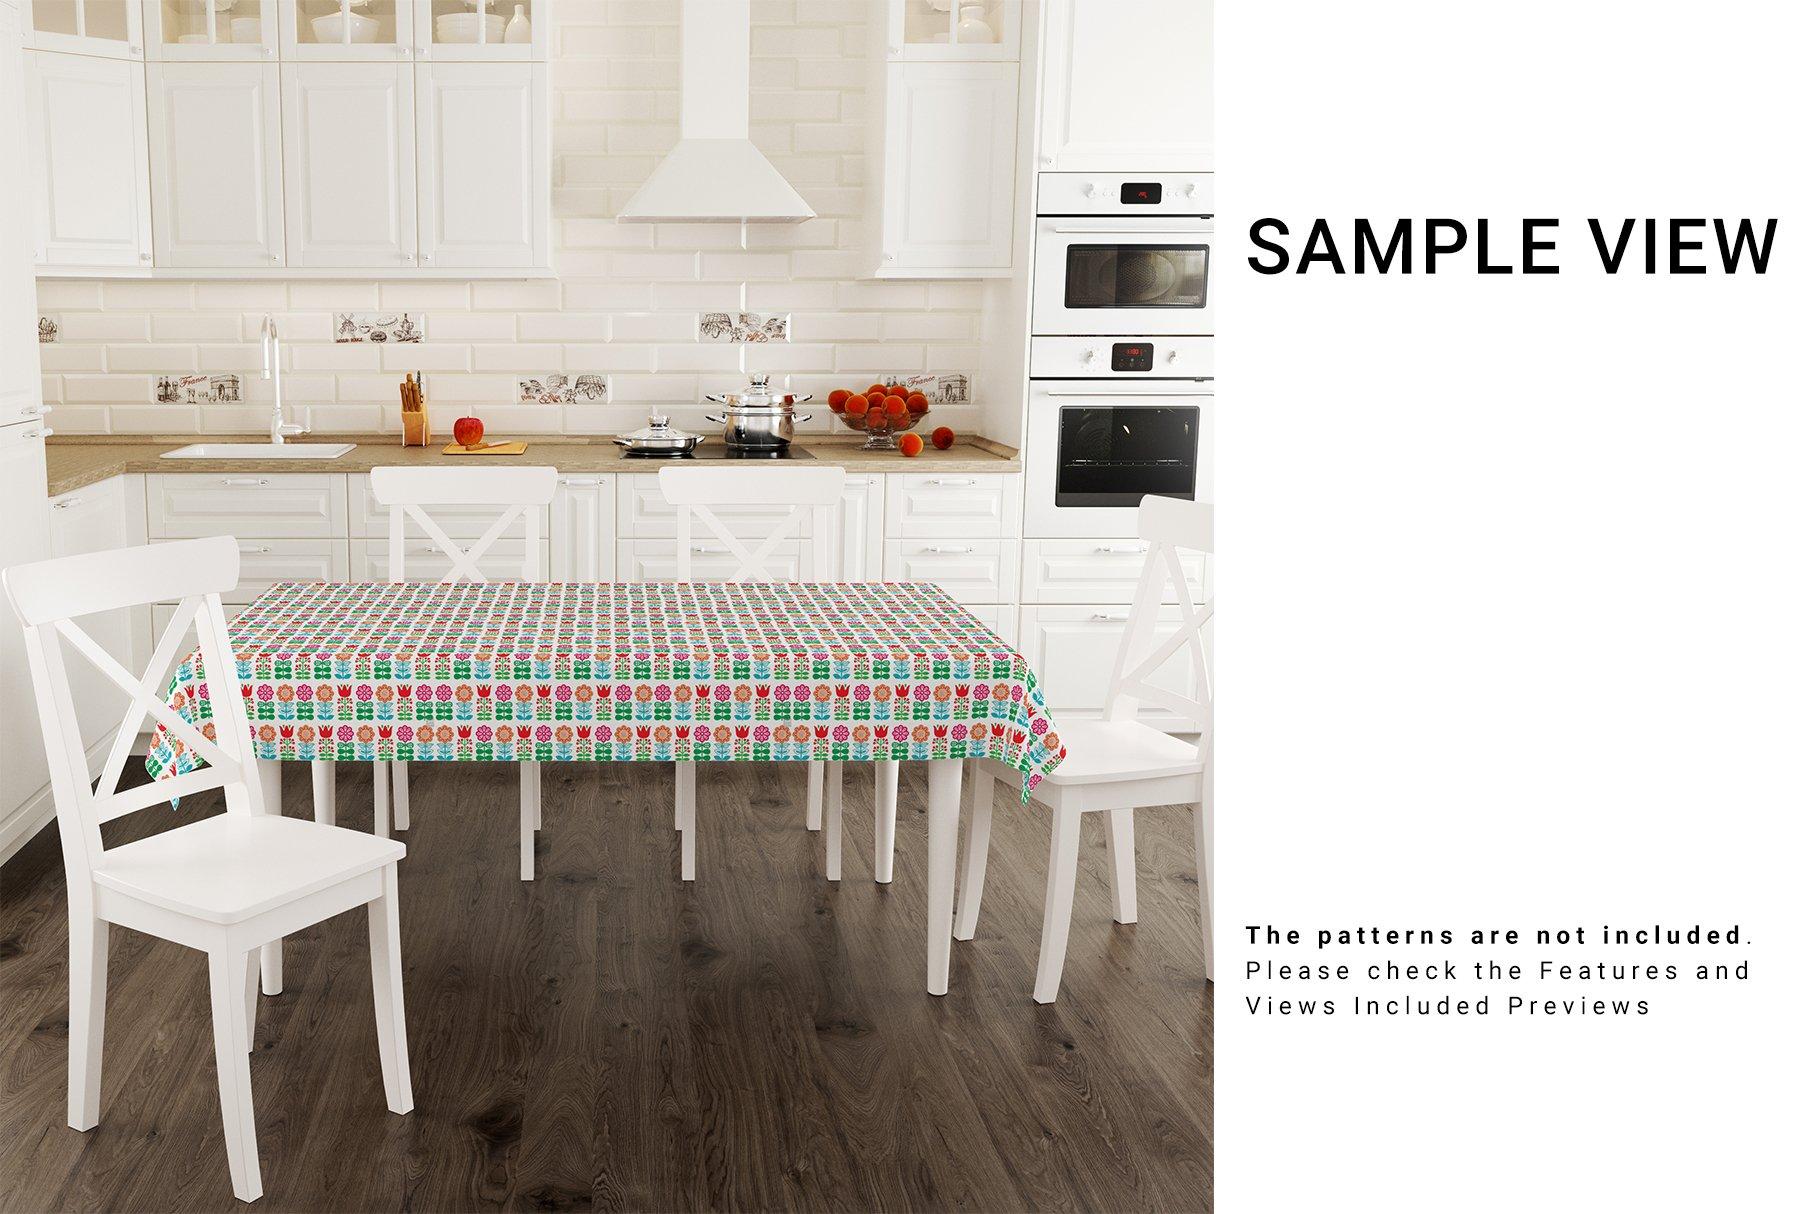 Kitchen Tablecloth 3D Mockup Set example image 5